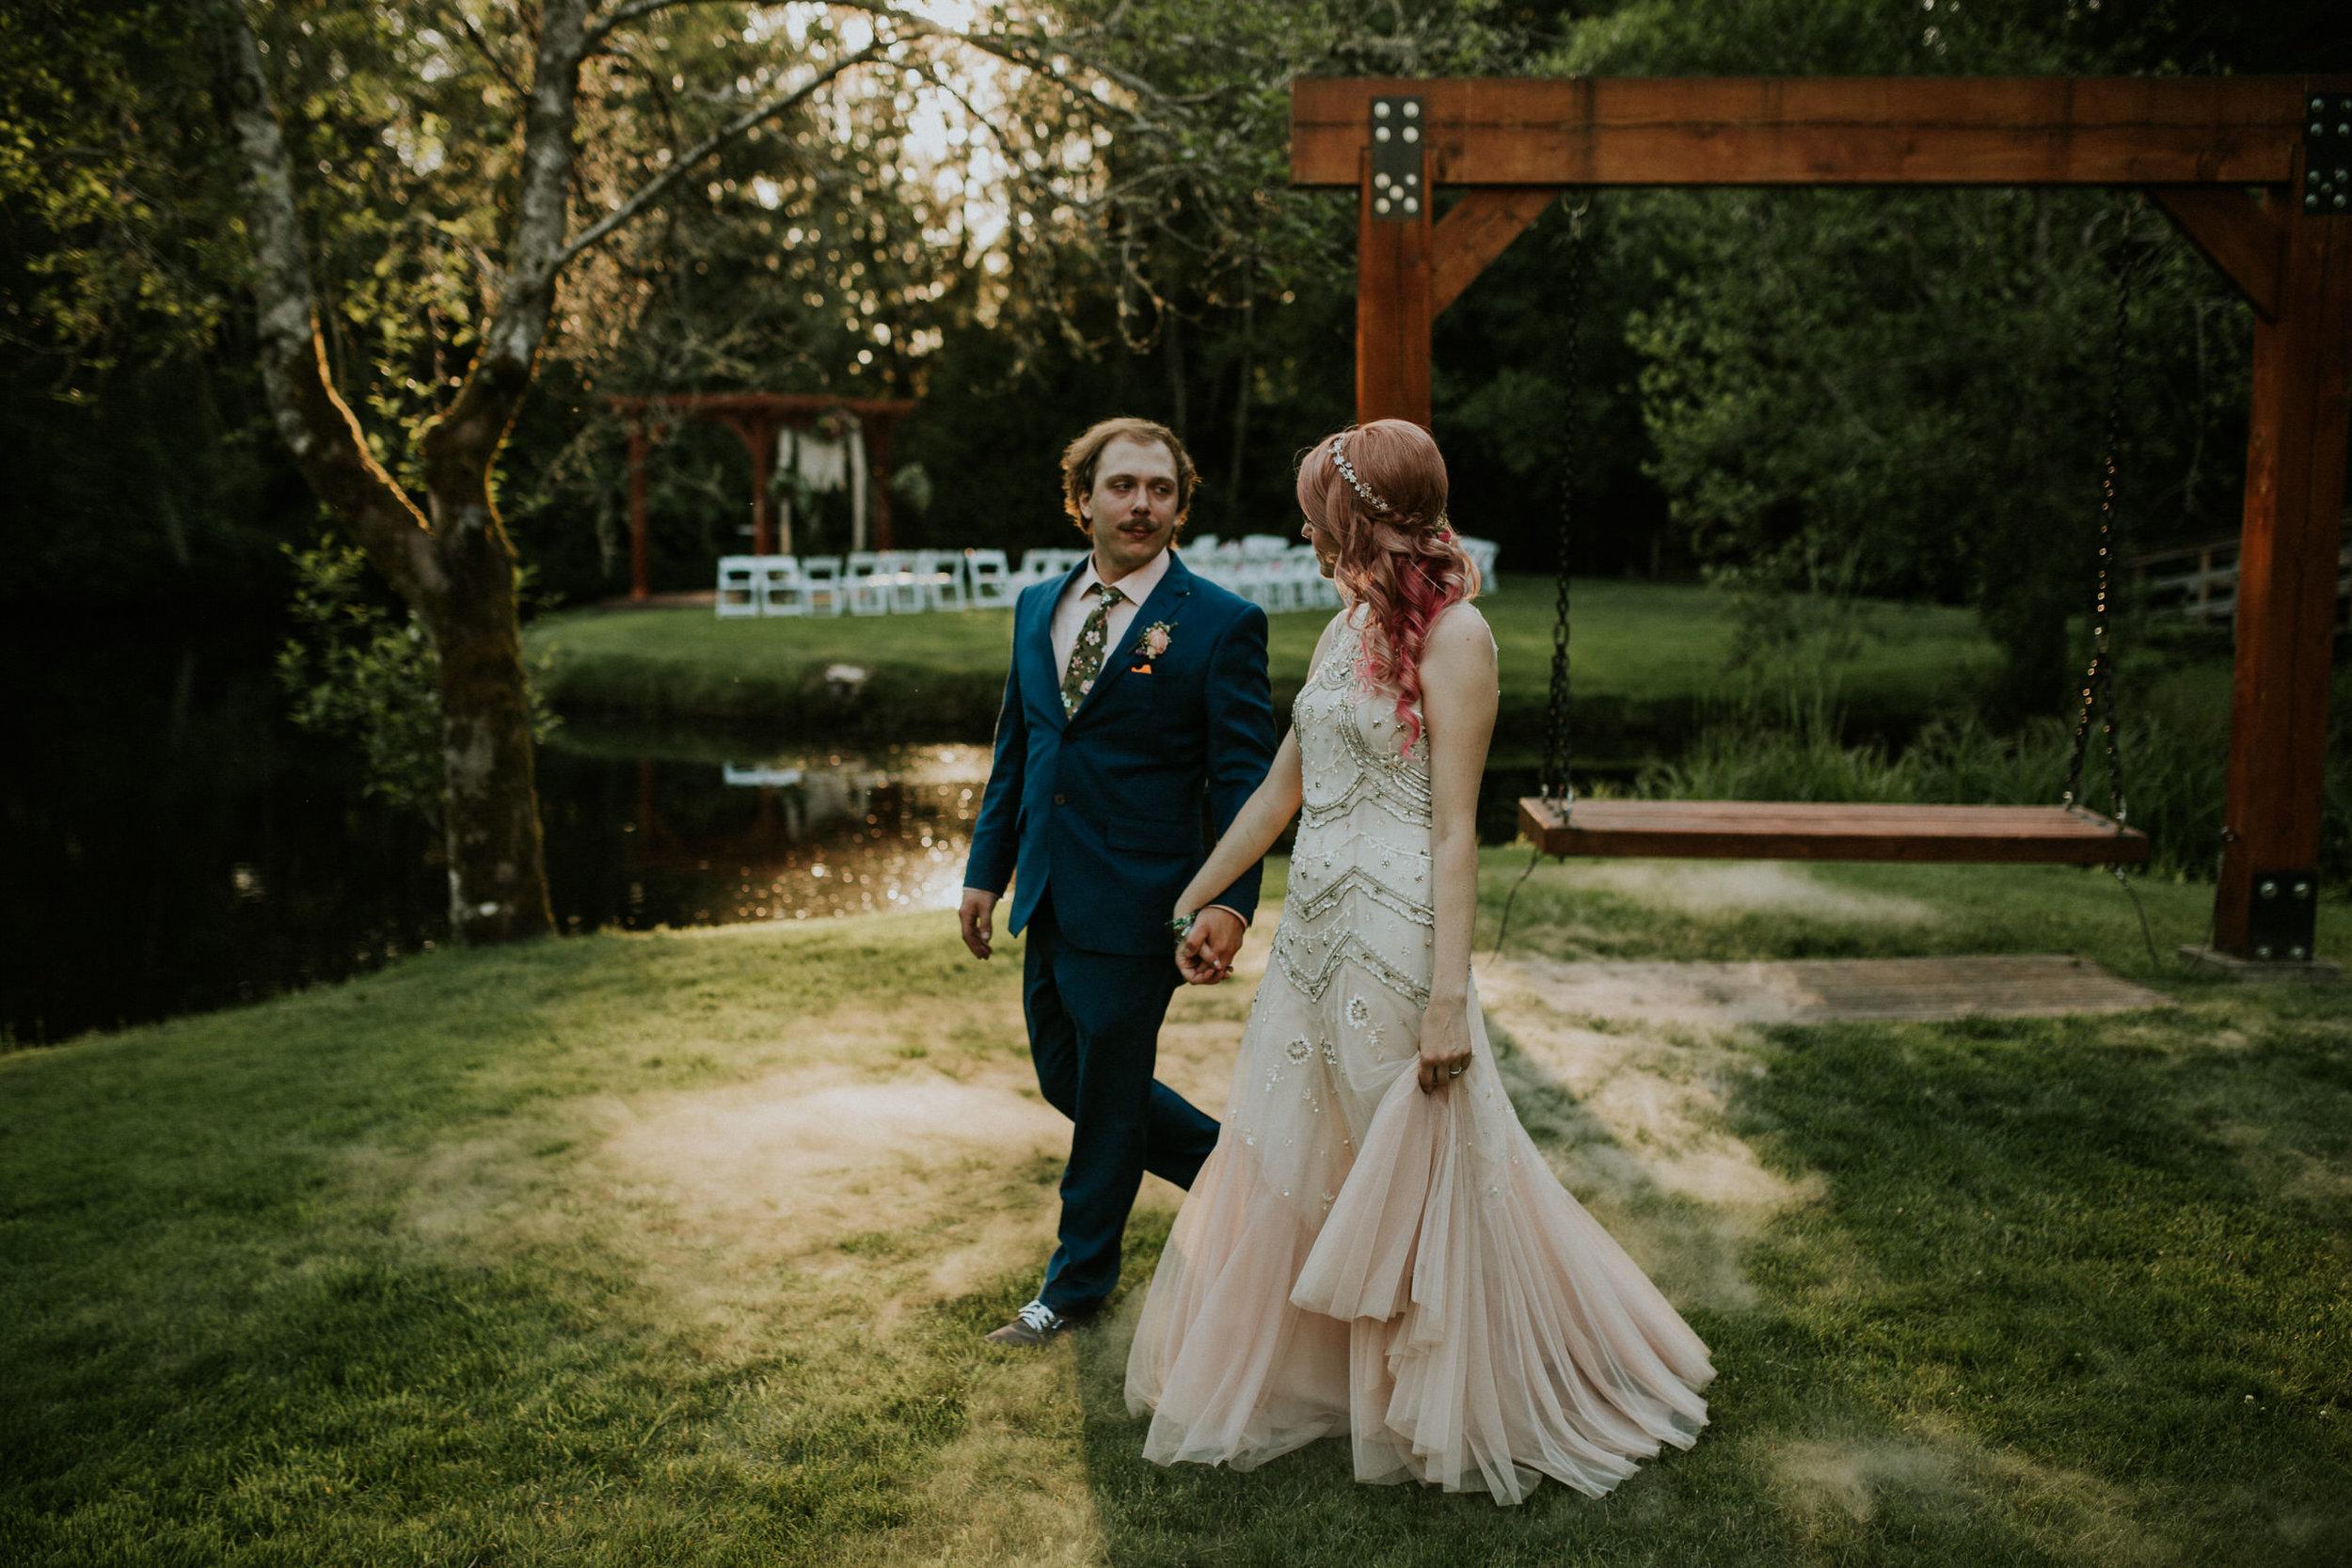 seattle elopement photographer intimate wedding photography